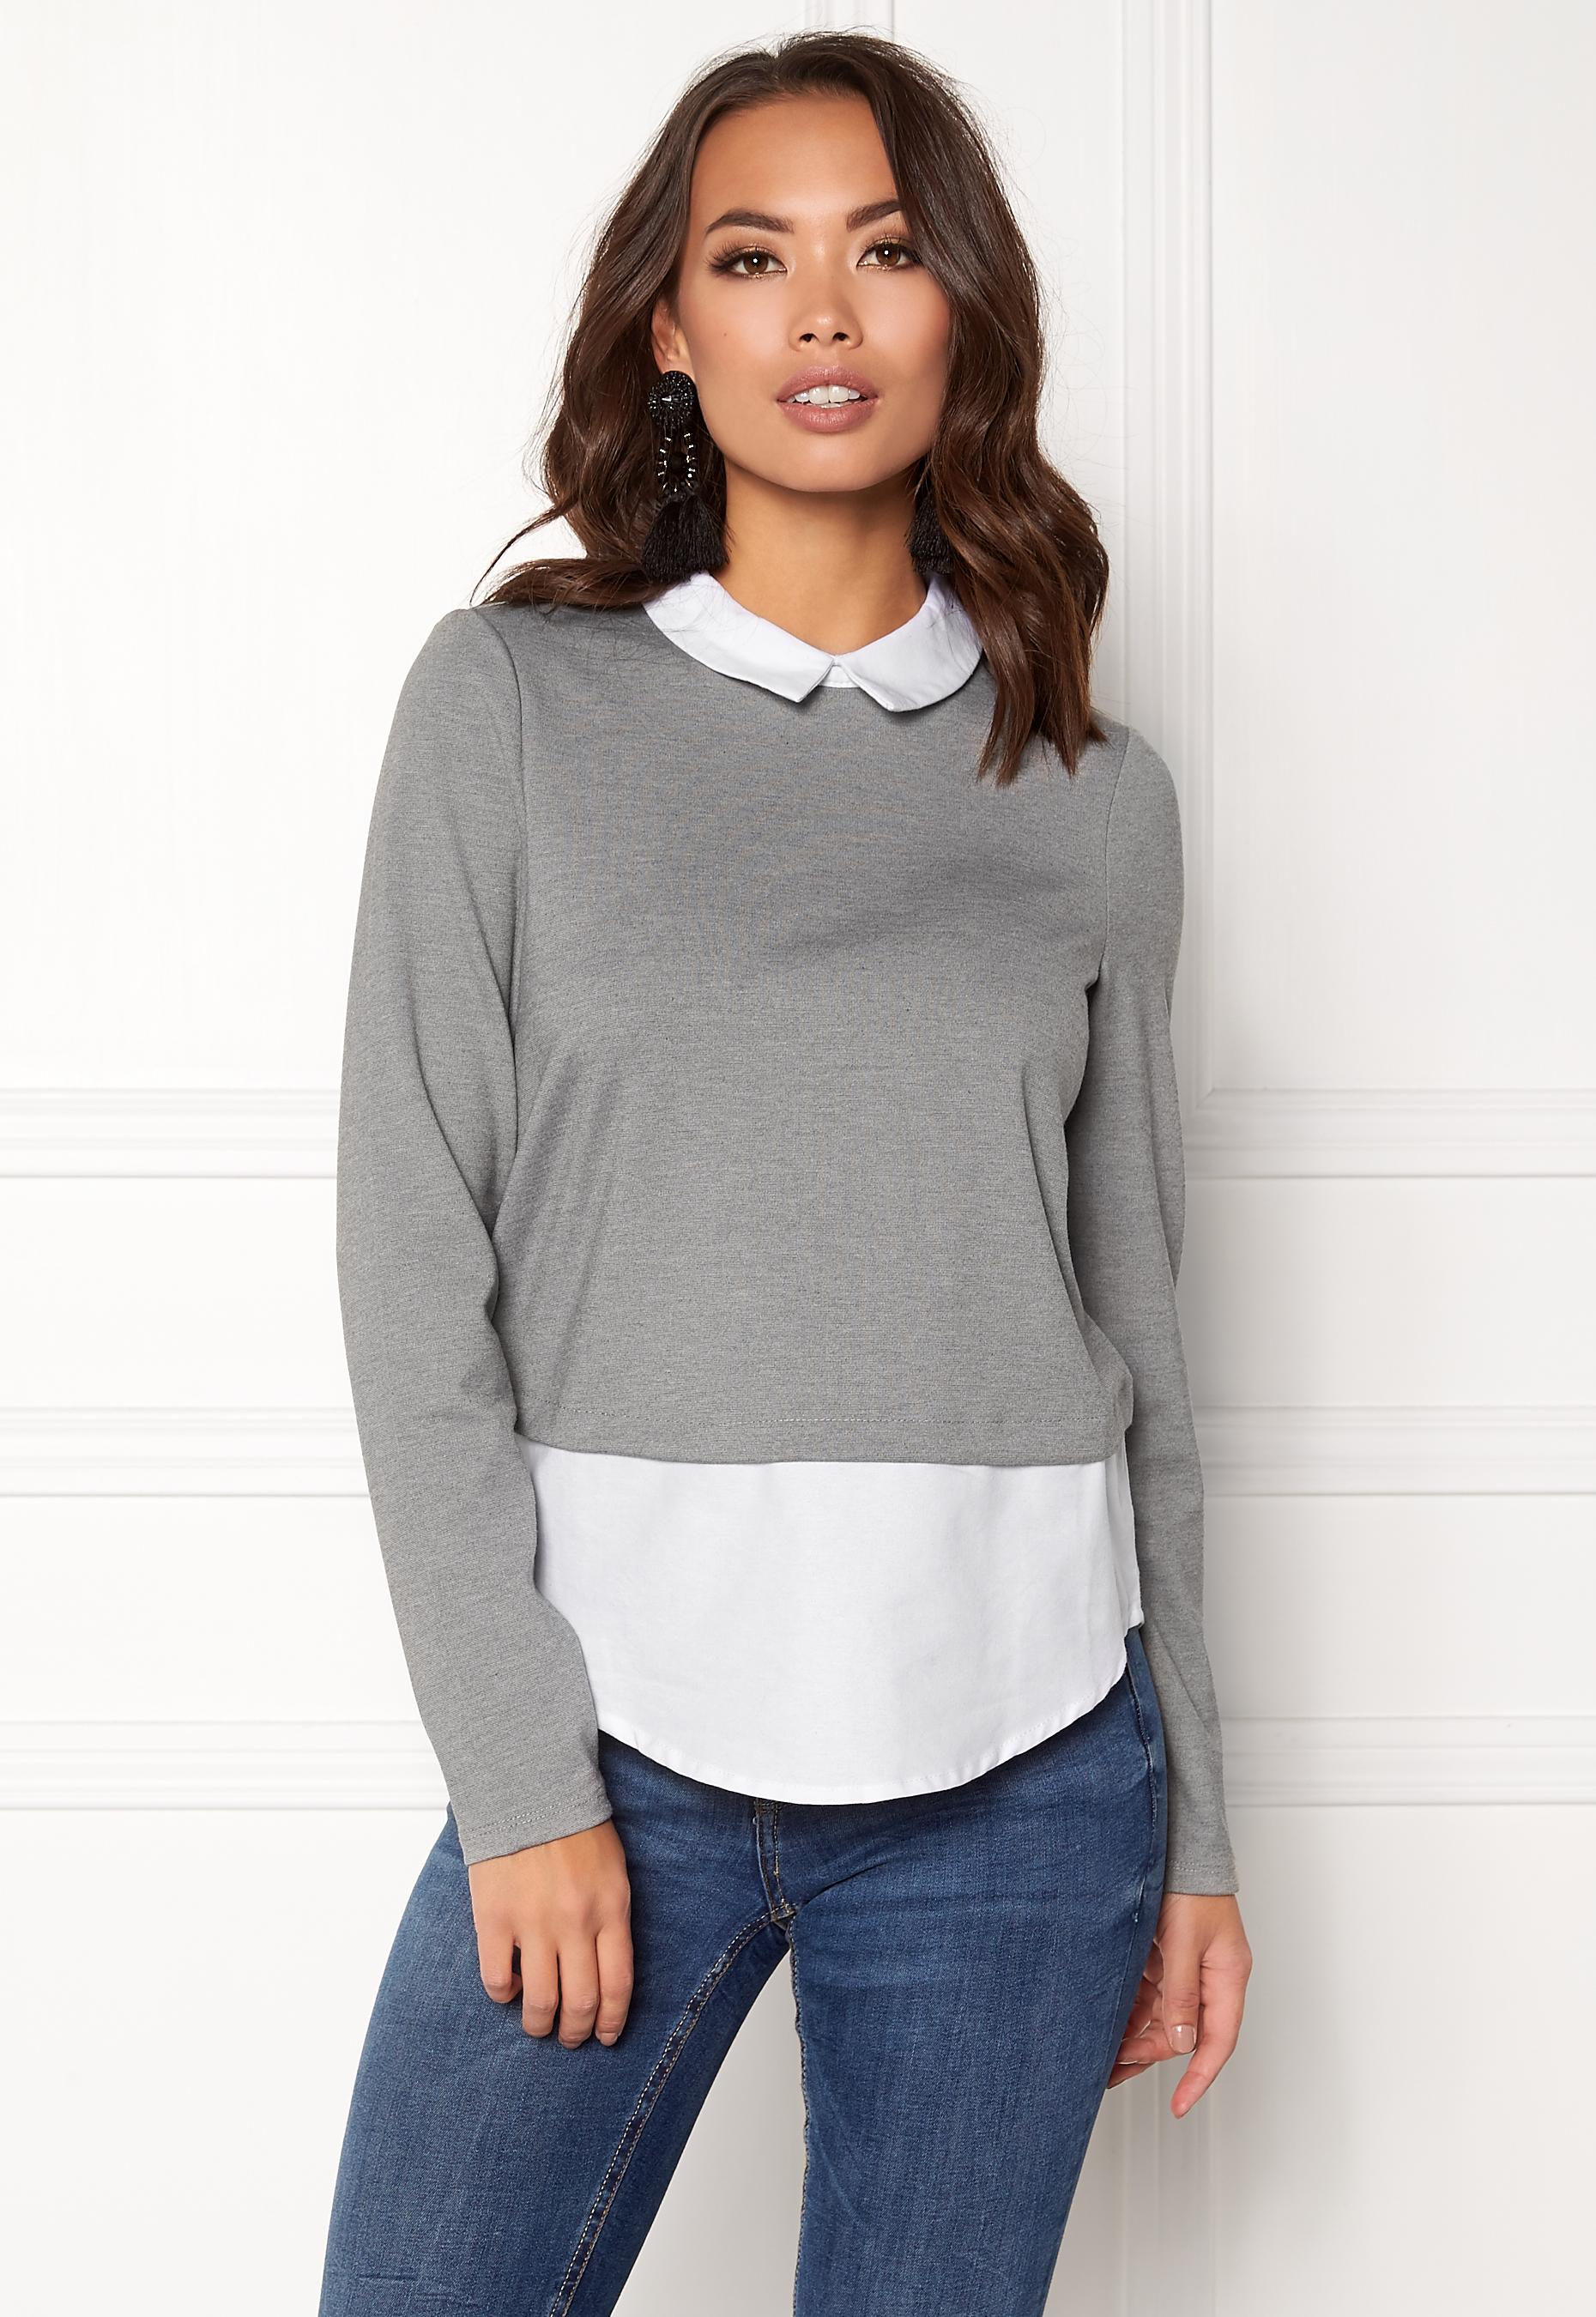 Ls Grey Melange Top Shirt Cindy Moda Vero Medium Bubbleroom UYqwW